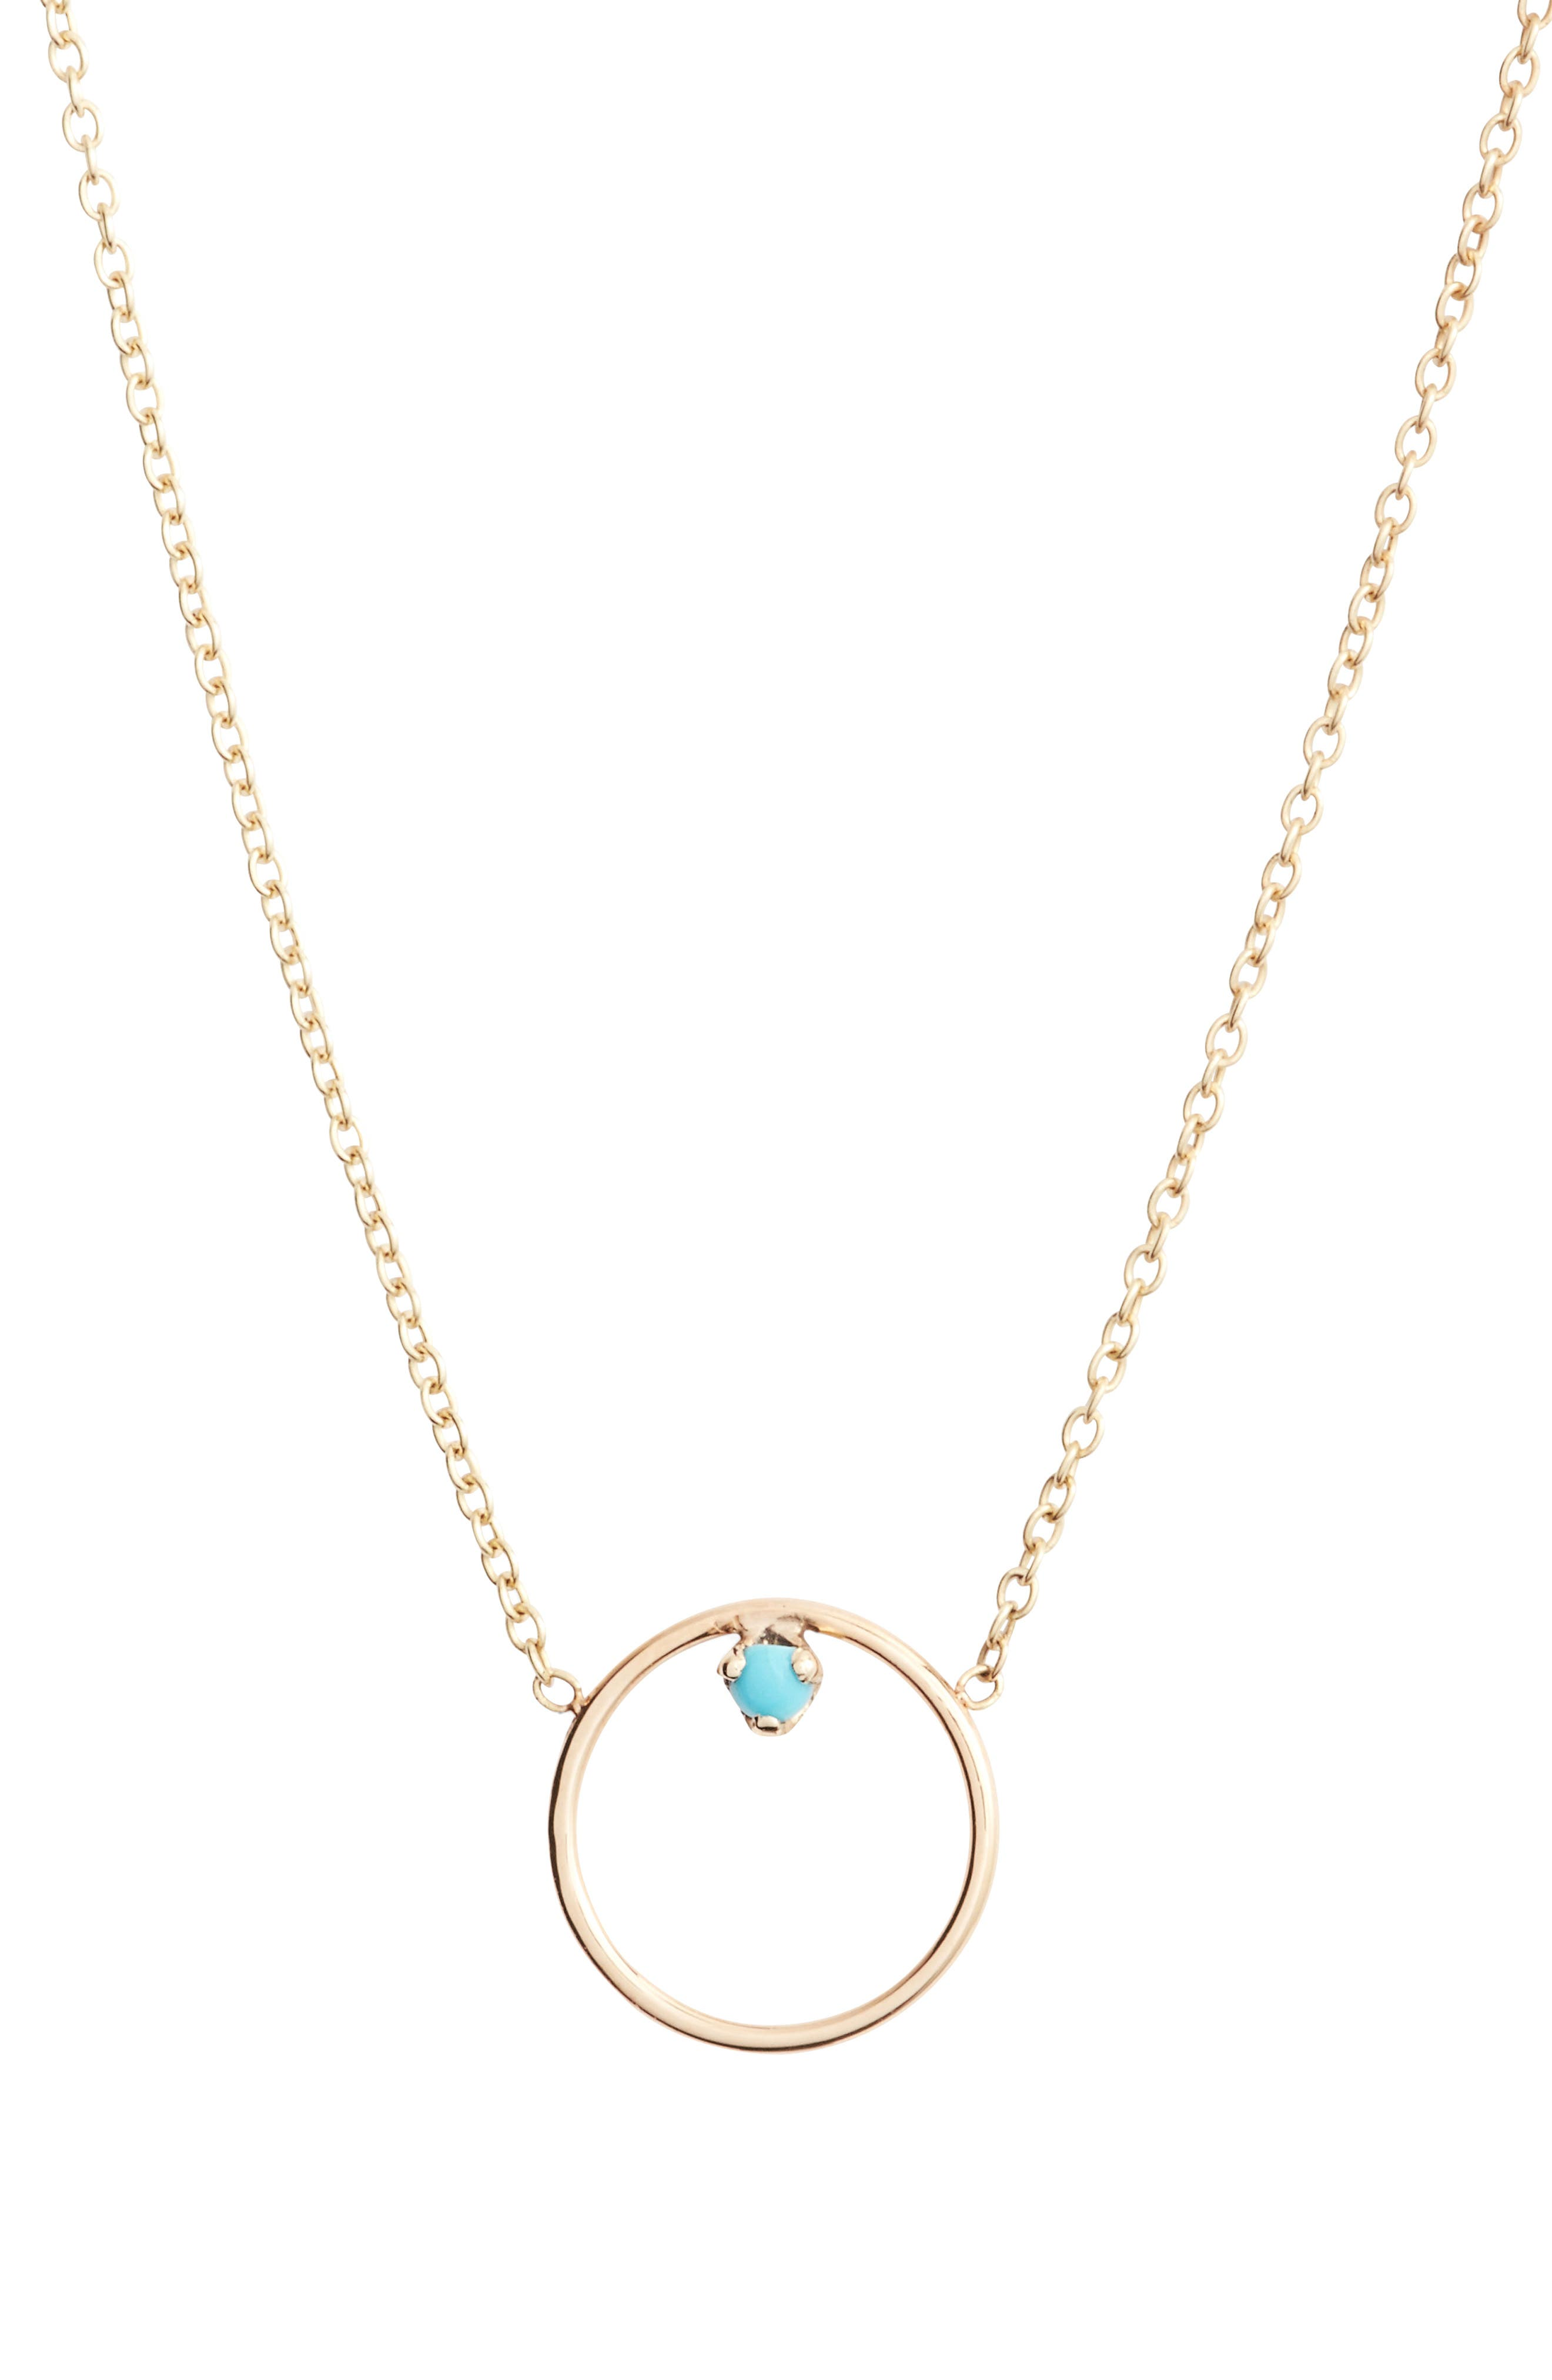 Main Image - Zoë Chicco Turquoise Circle Pendant Necklace